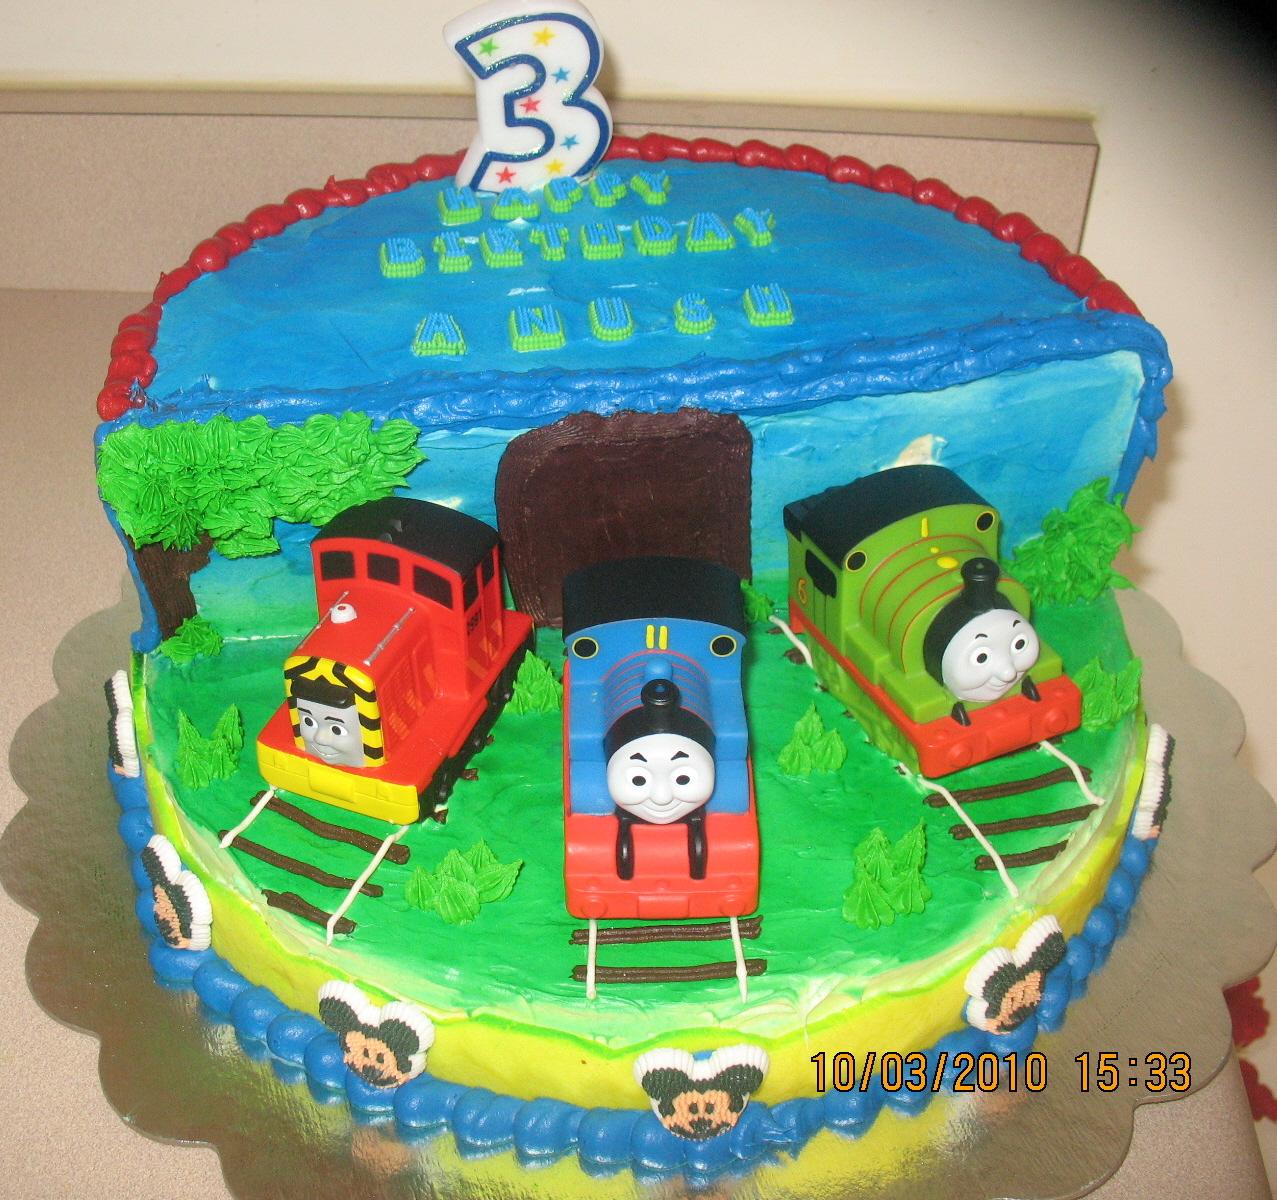 Anu Cakes N Bakes Anush S 3rd Birthday Cake Thomas And